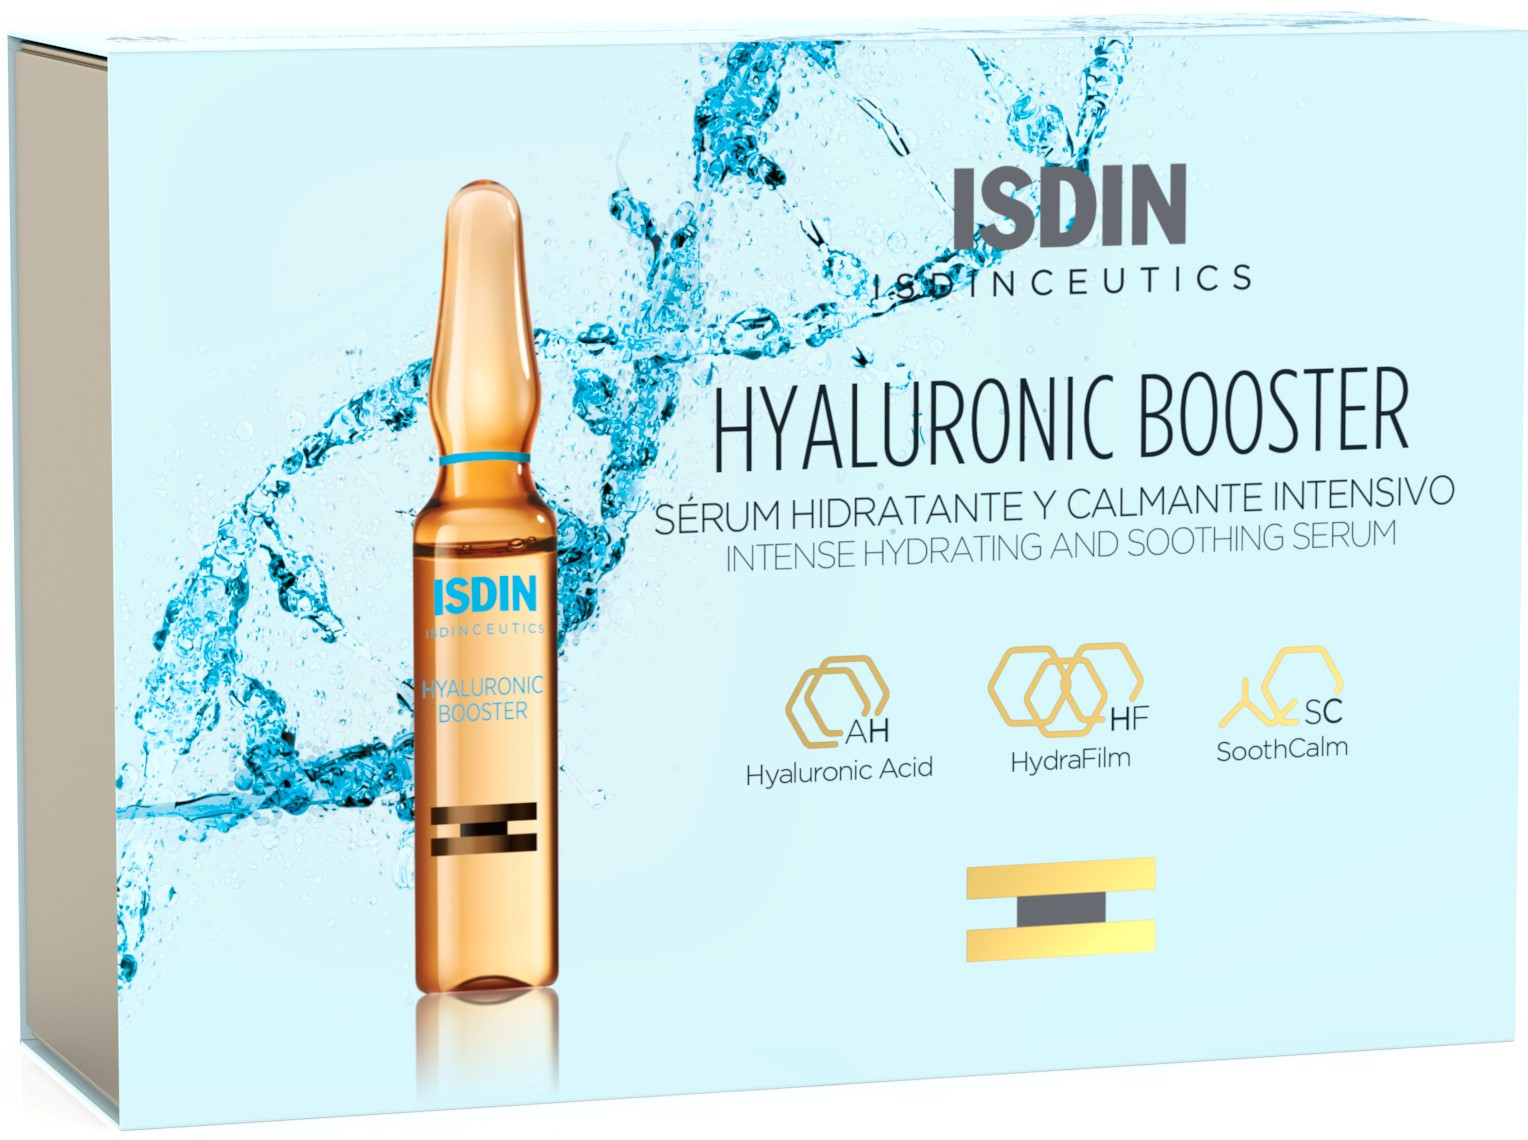 Isdinceutics - Hyaluronic Booster Sérum Hidratante 10 Ampolas x 2ml